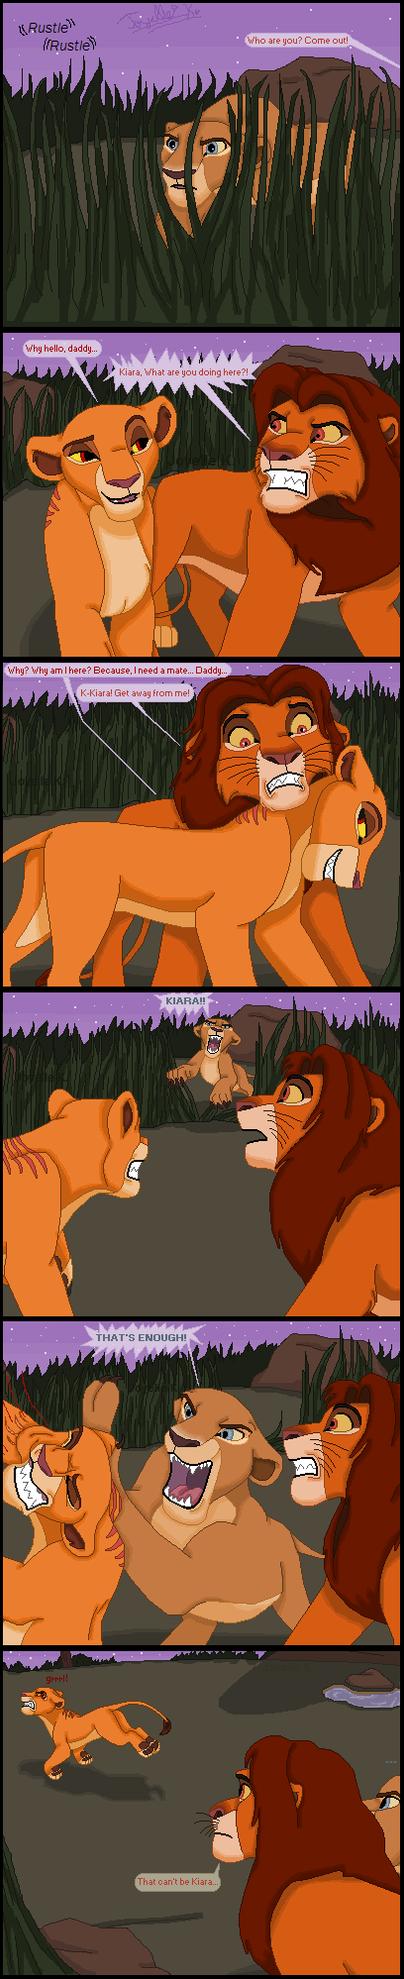 Kiara encounters Simba by TLK-Peachii